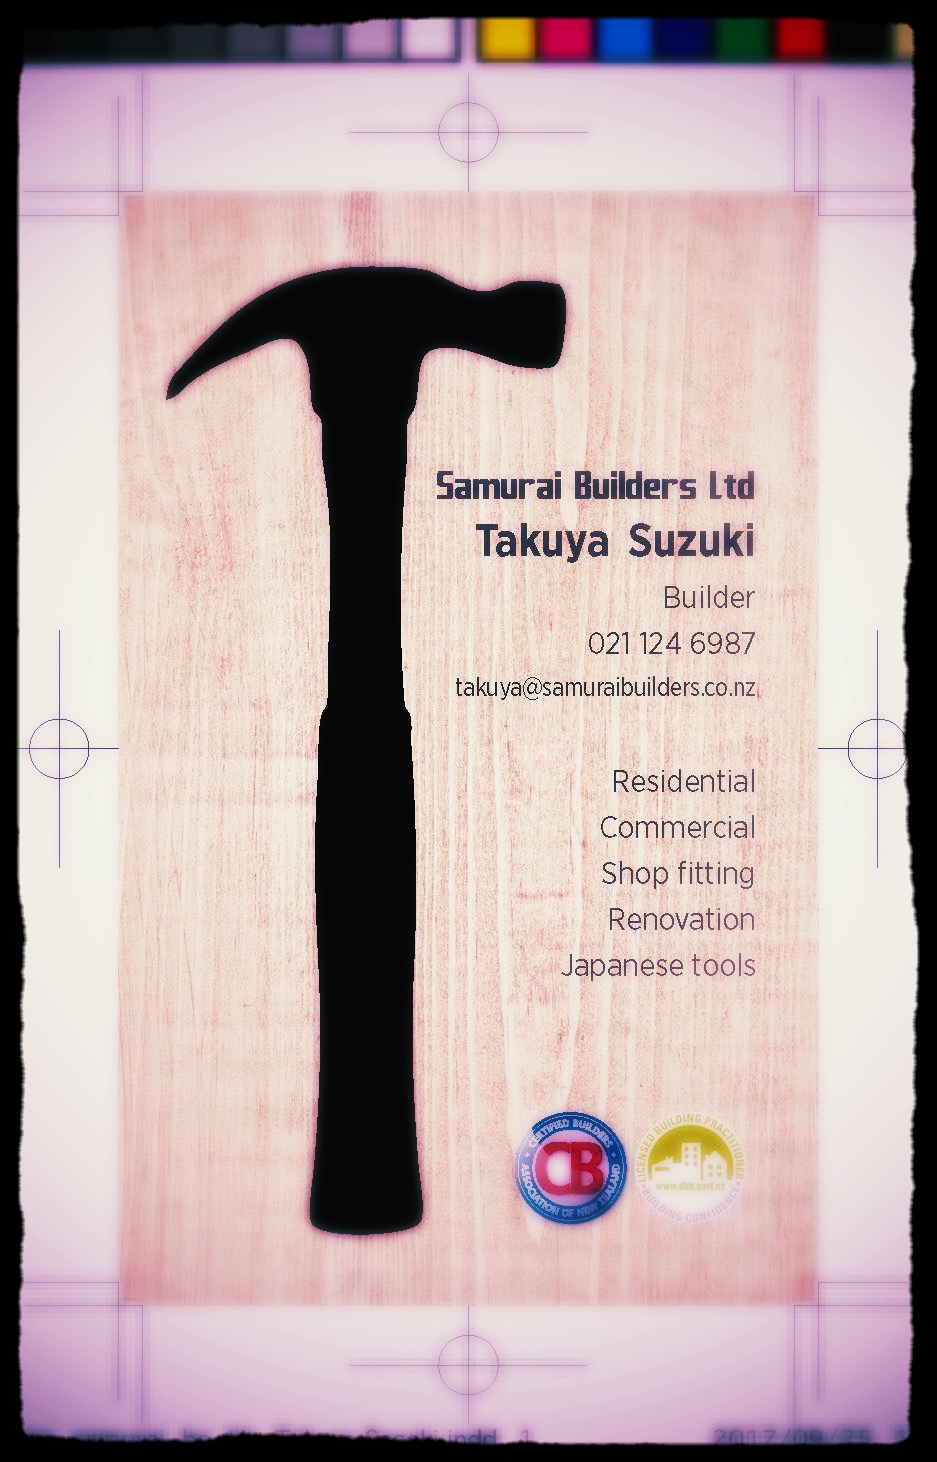 wms_samurai_bc_Mr_Takuro Sasaki_ページ_1_edited